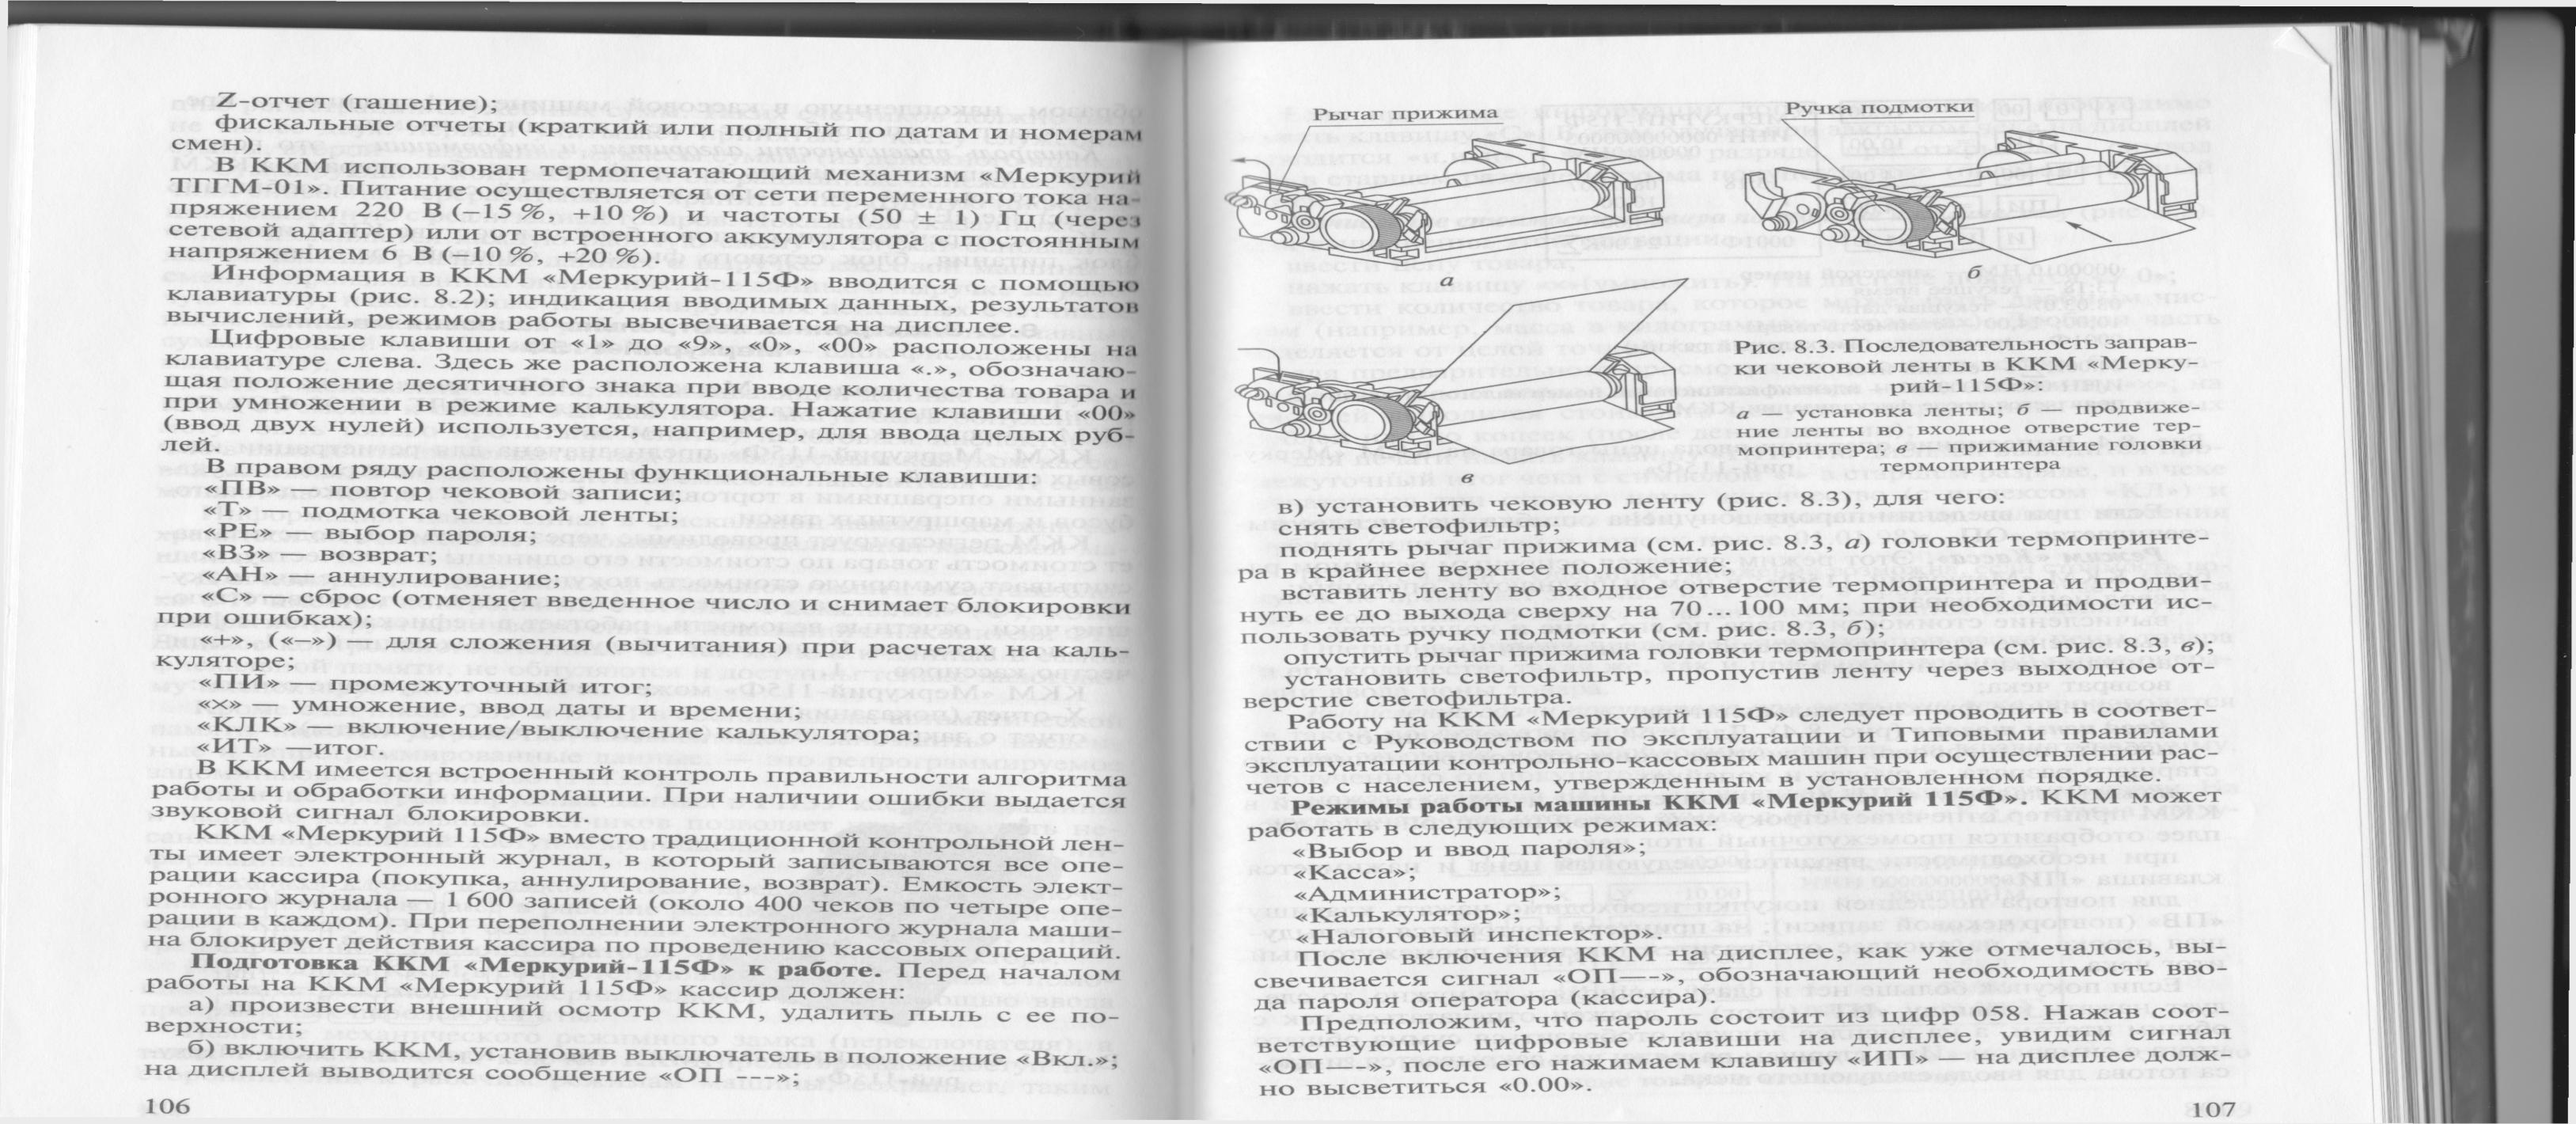 инструкция кассового аппарата меркурий 115 ф